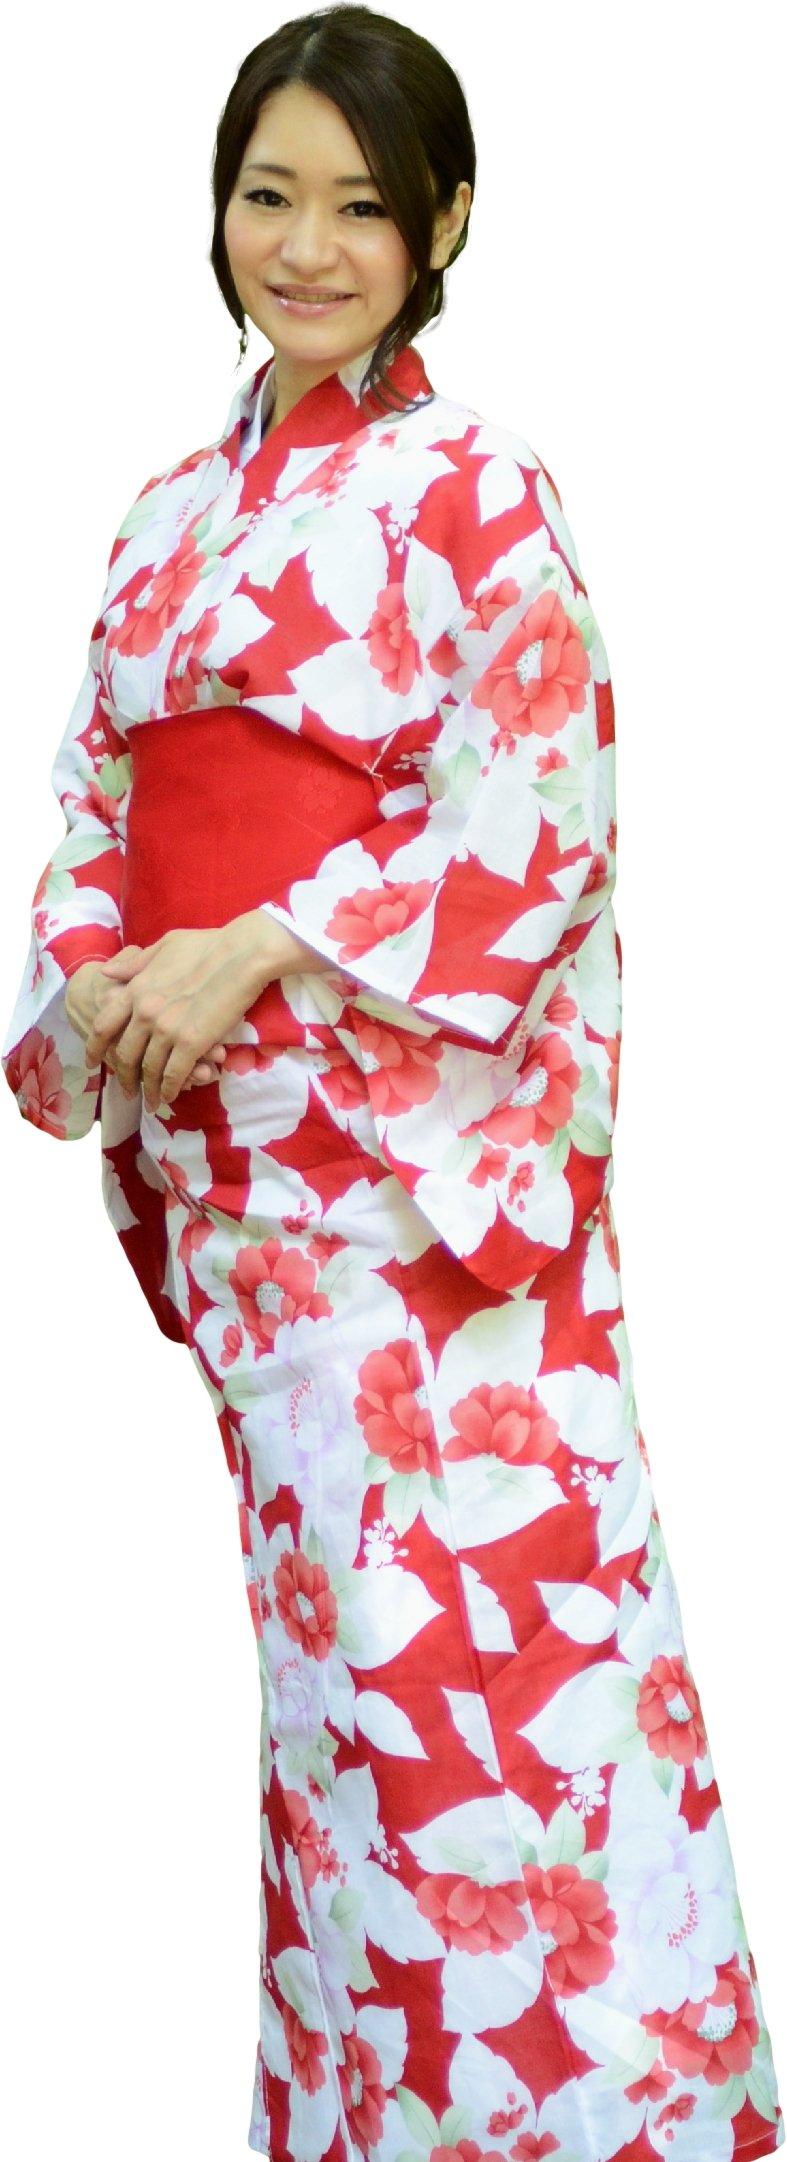 a077d5771 Get Quotations · sakura Women Japanese Yukata obi belt set/ Red flower  pattern